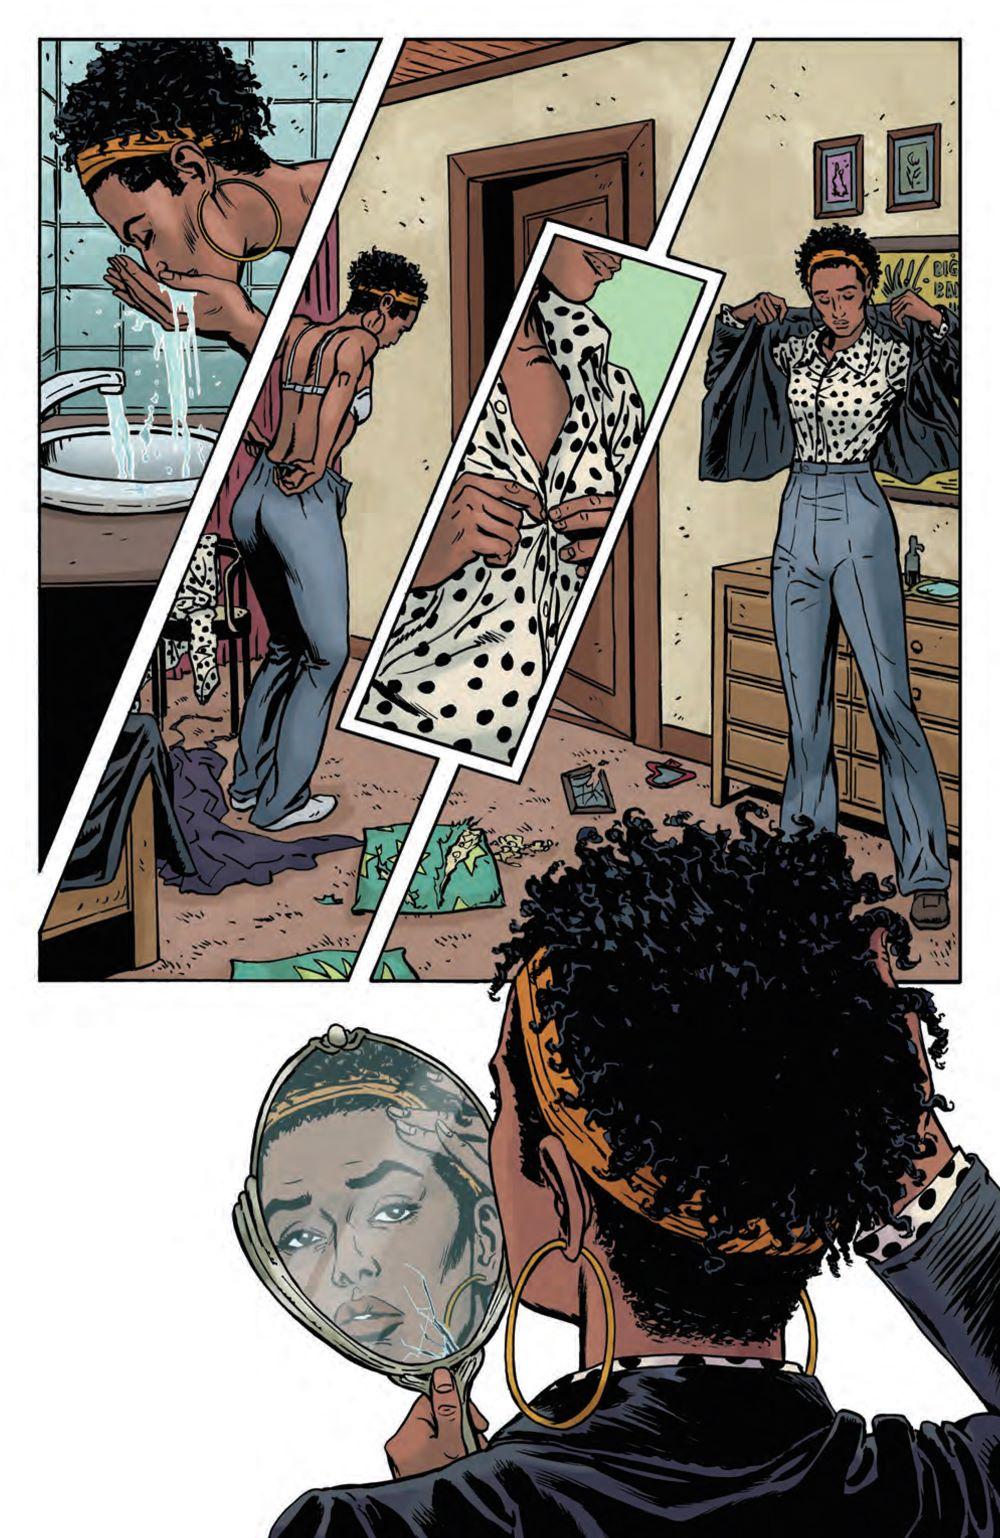 Abbott_1973_003_PRESS_7 ComicList Previews: ABBOTT 1973 #3 (OF 5)